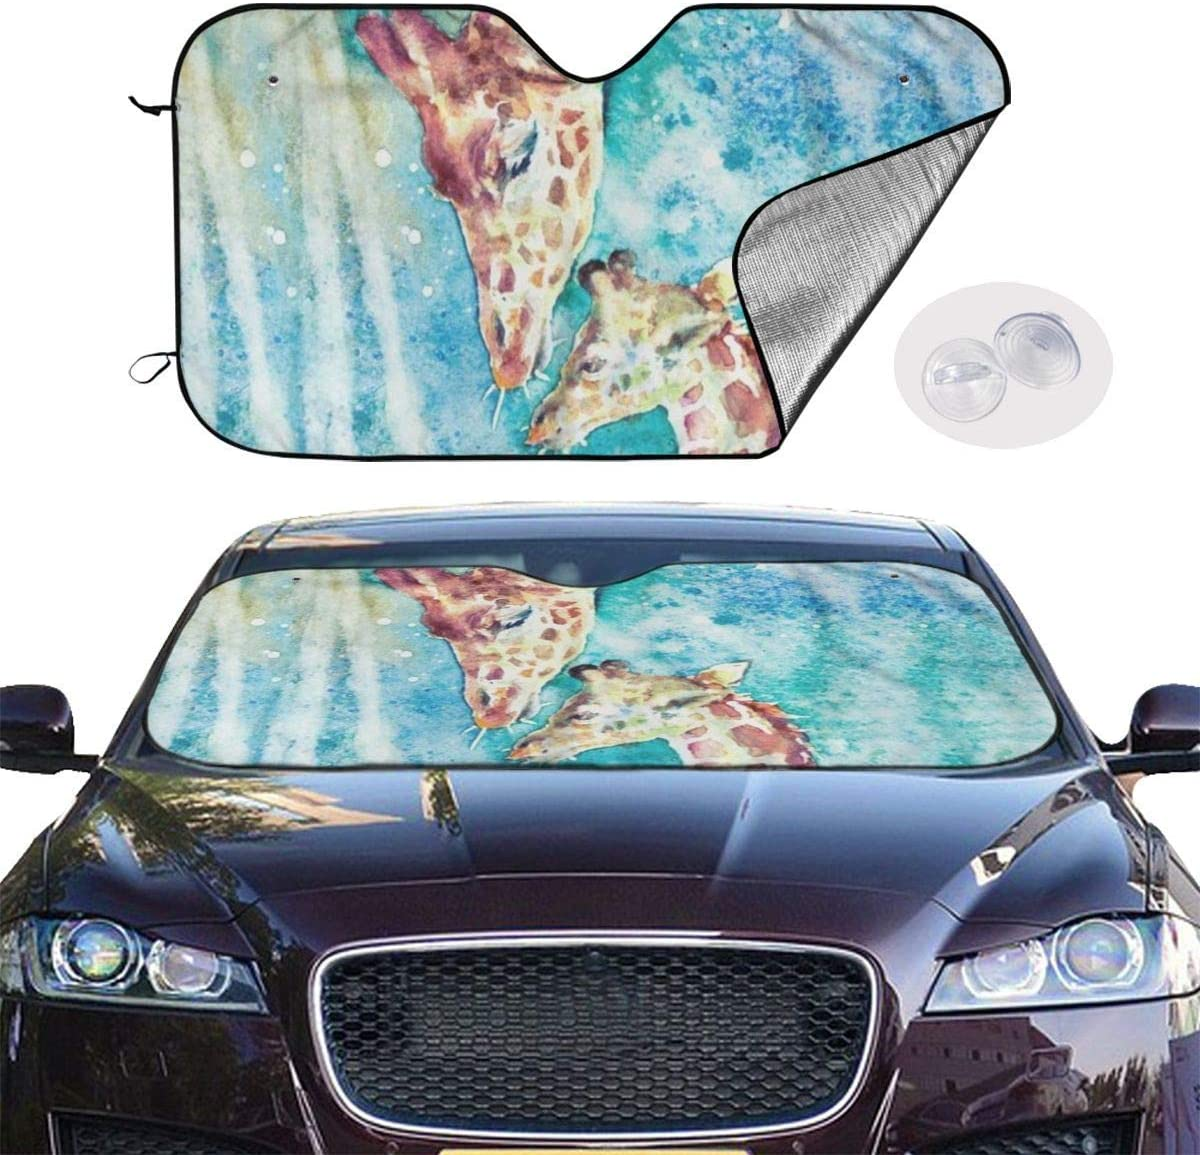 Car Windshield Sun Shade Watercolor Two Giraffes Animal Art UV Sun and Heat Reflector Visor Protector 130x70cm Y.Z.L